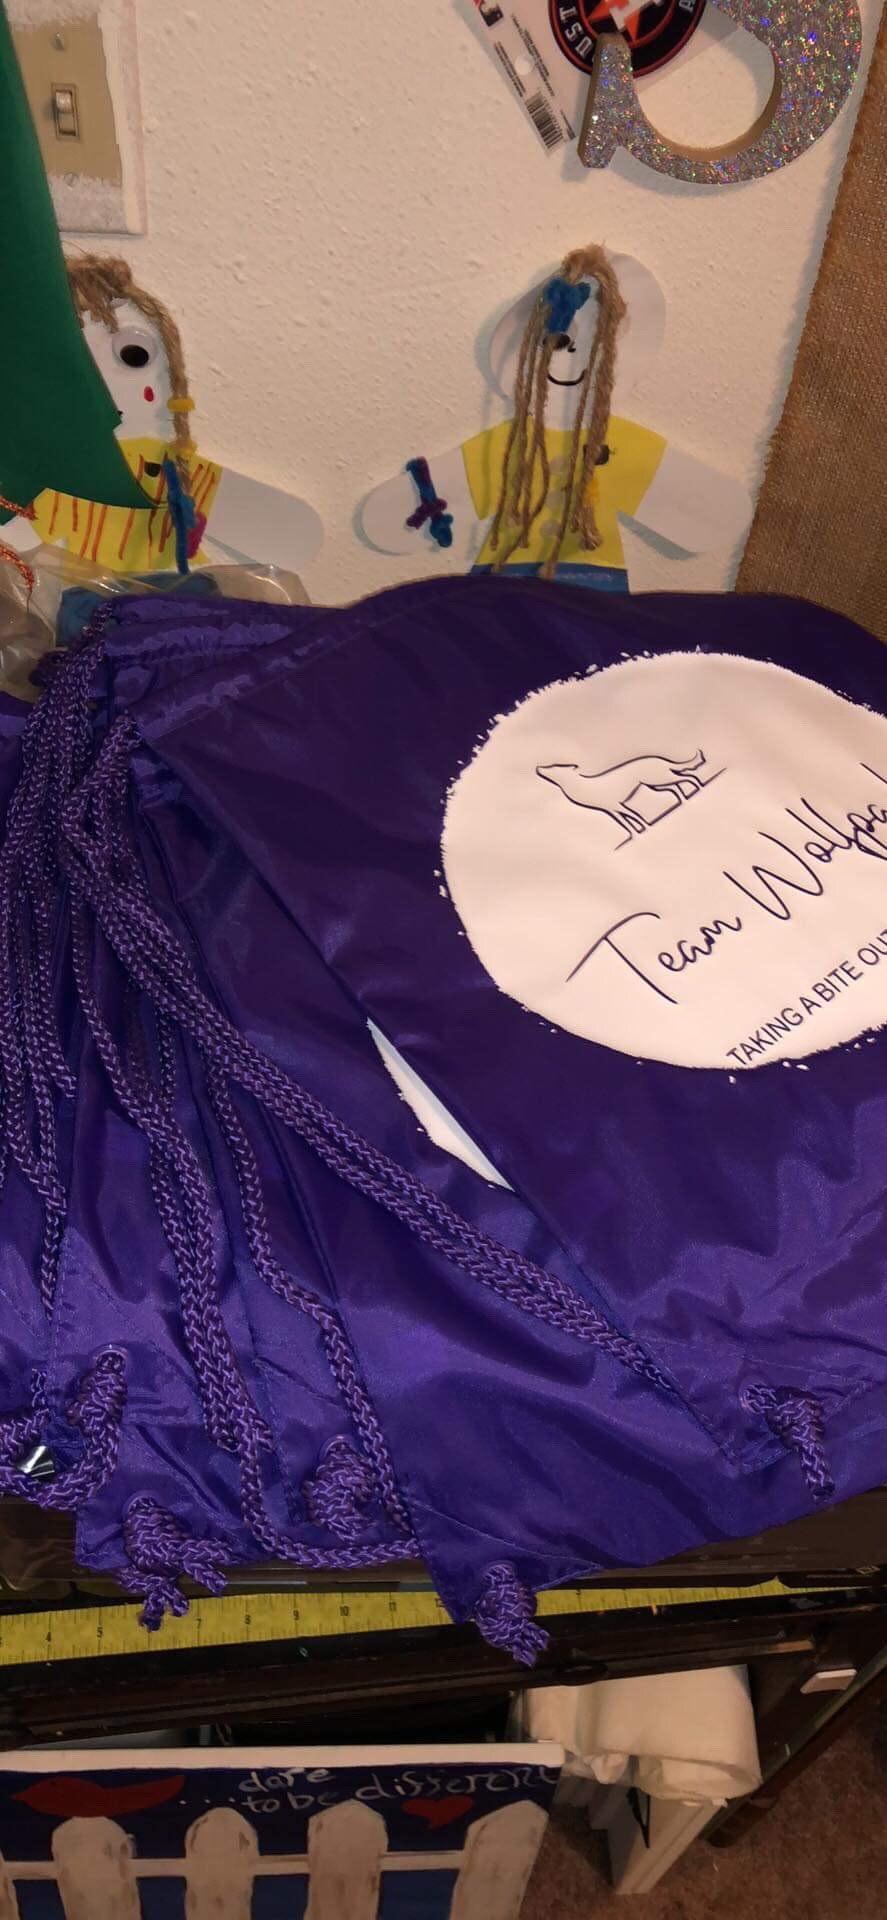 Liberty Bags 8881 customer review by Tina Casanova WolfSwag2